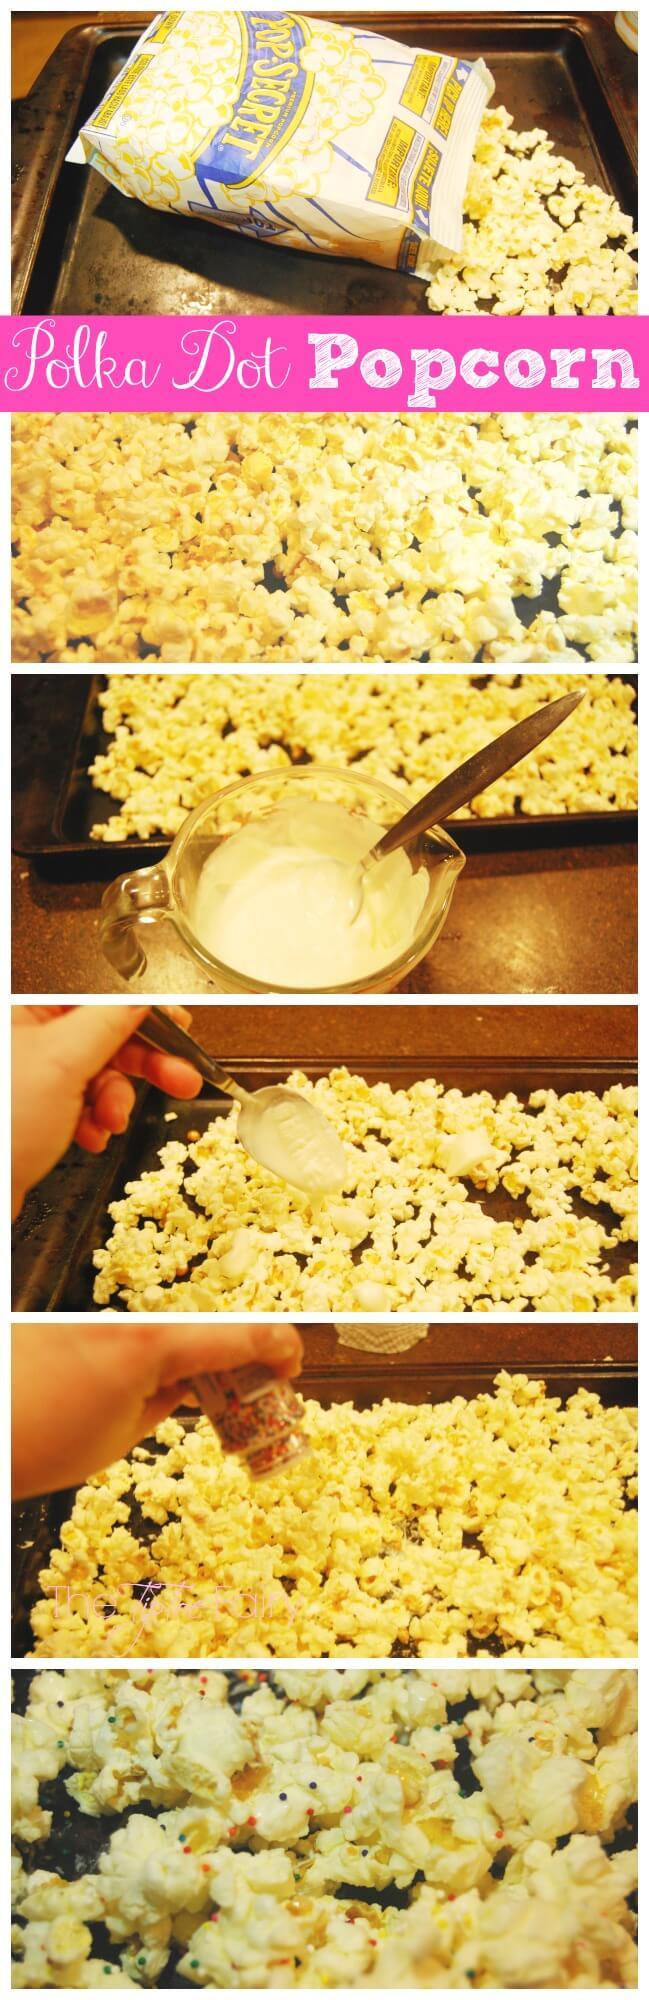 Use the Perfect Pop App to make some Polka Dot Popcorn | The TipToe Fairy #PerfectPop #GoodbyeBurnedPopcorn #sp #popcornrecipes